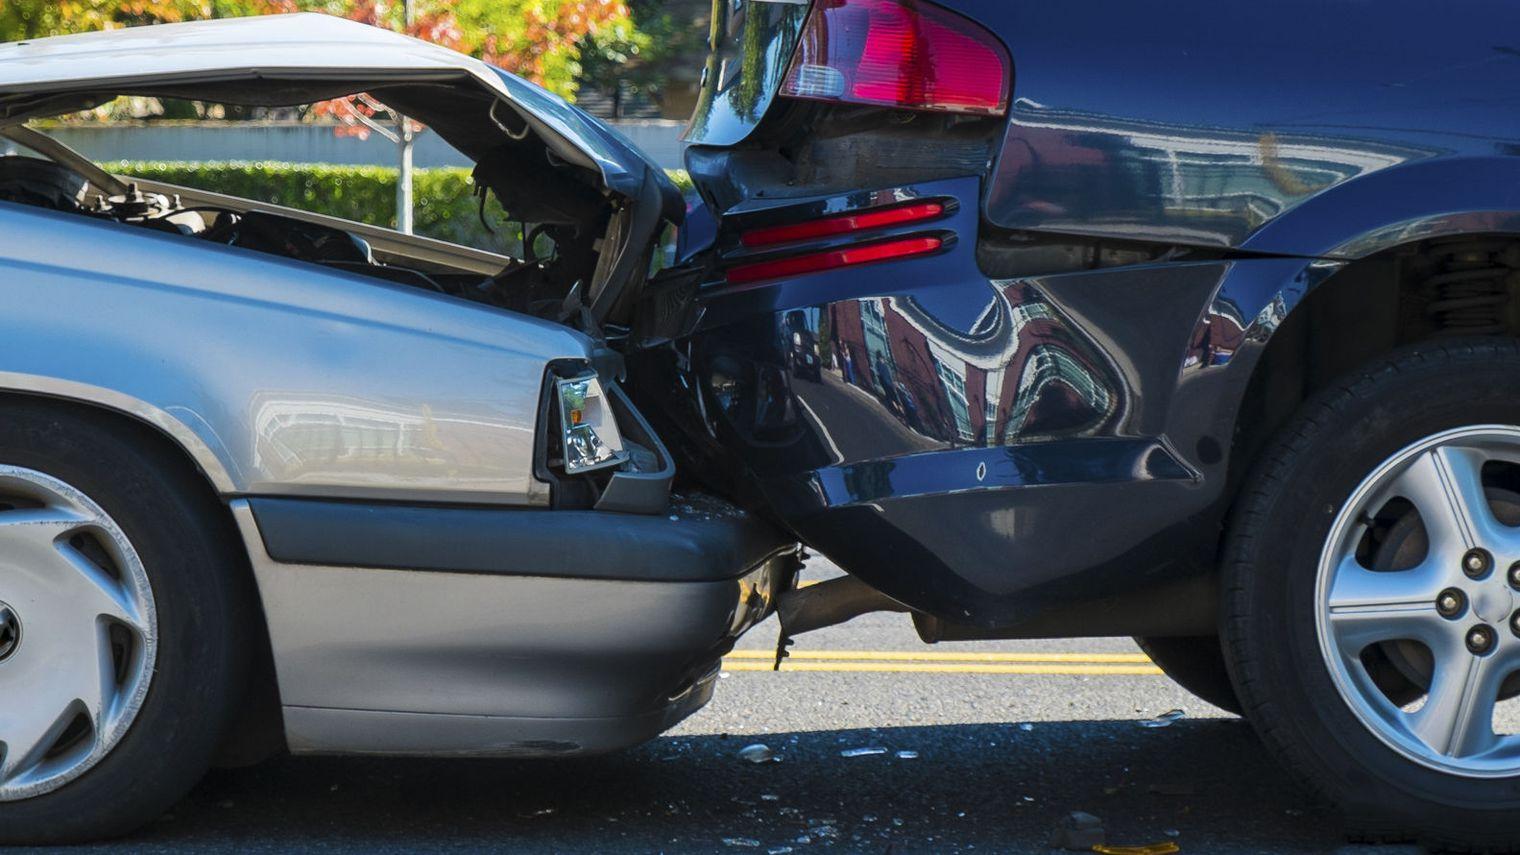 Cabinet Gicquel Accident voiture